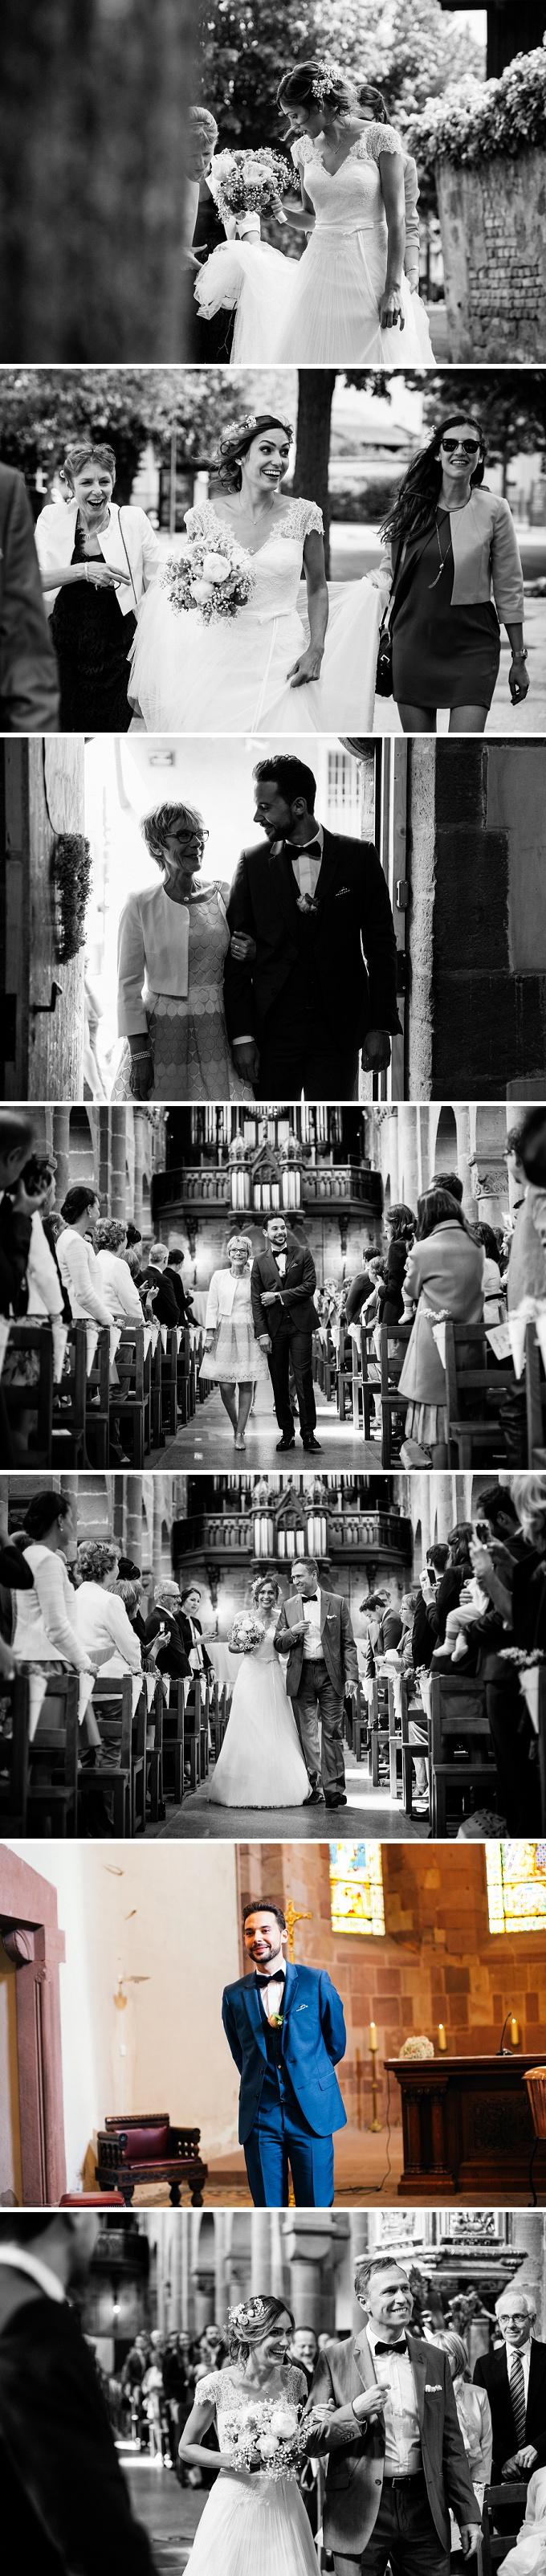 mariage-chateau-dosthoffen-011.jpg